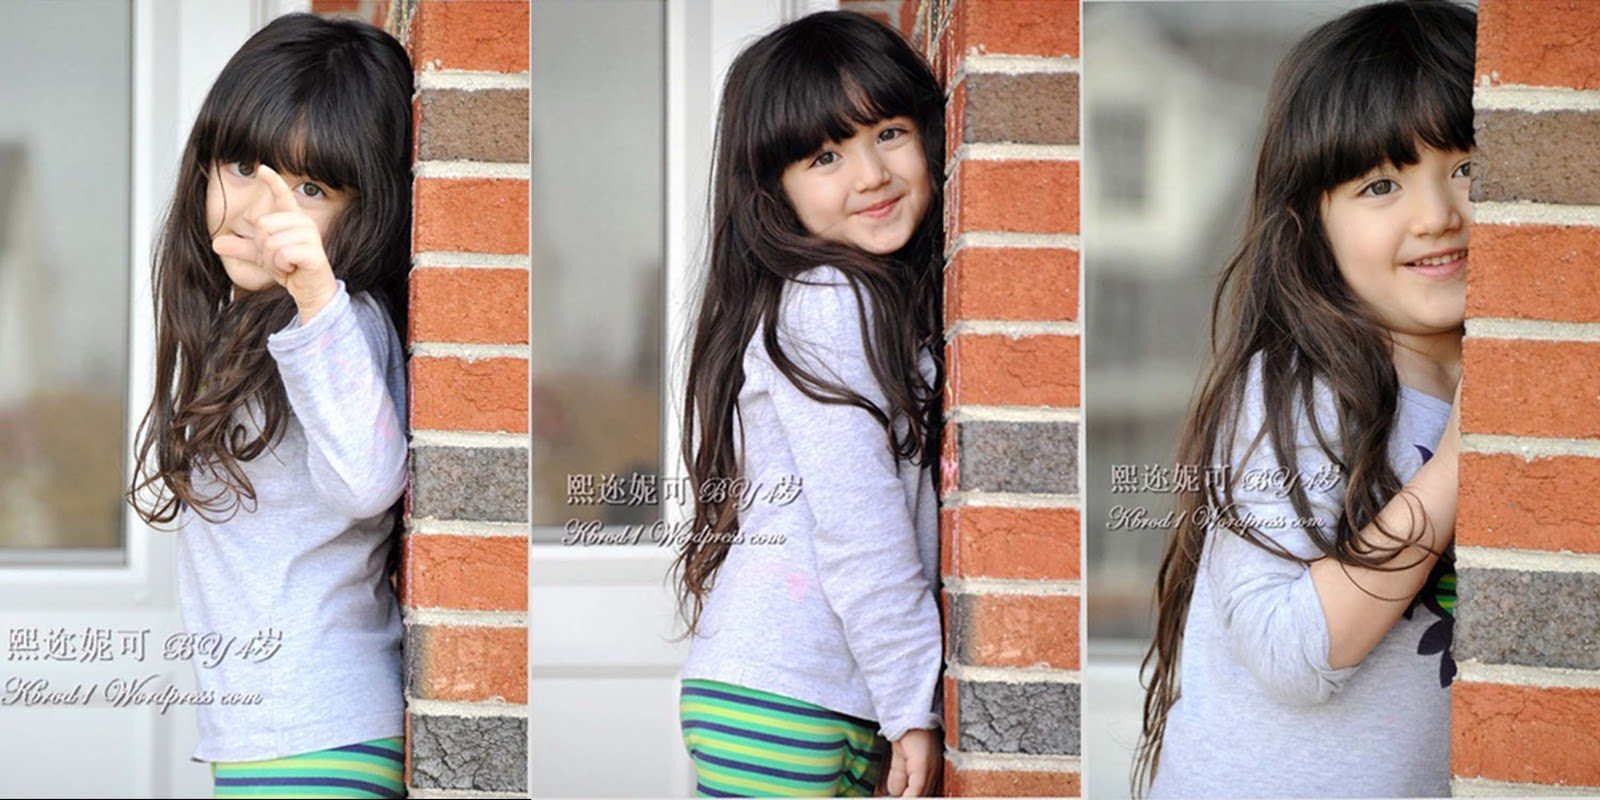 Kenneth Nicole Brodsky Gadis Kecil Tercantik Di Dunia Fakta